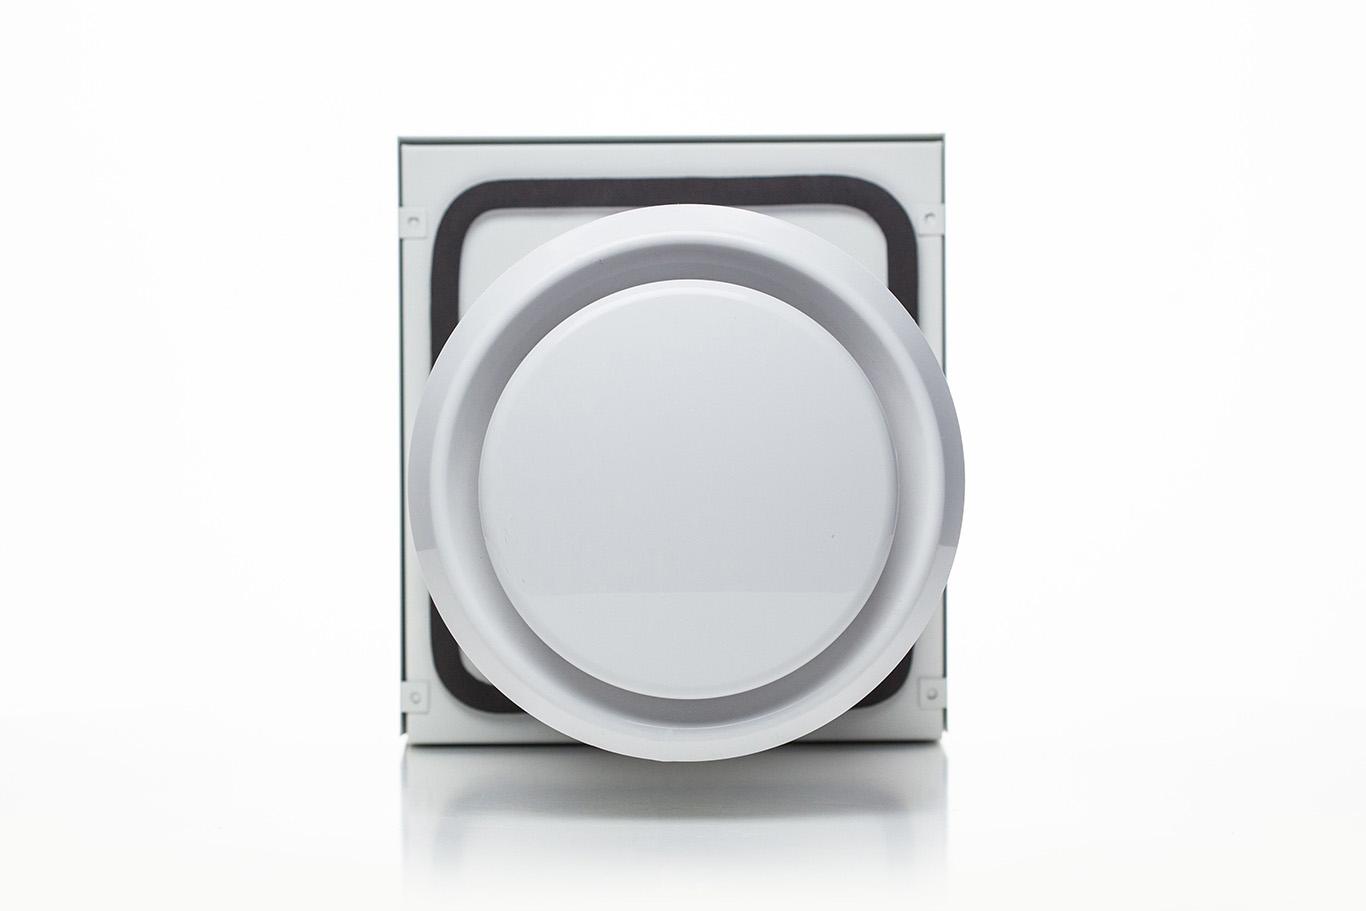 Ventoxx Comfort rekuperators impulsa vadība keramiskais siltuma akumulators